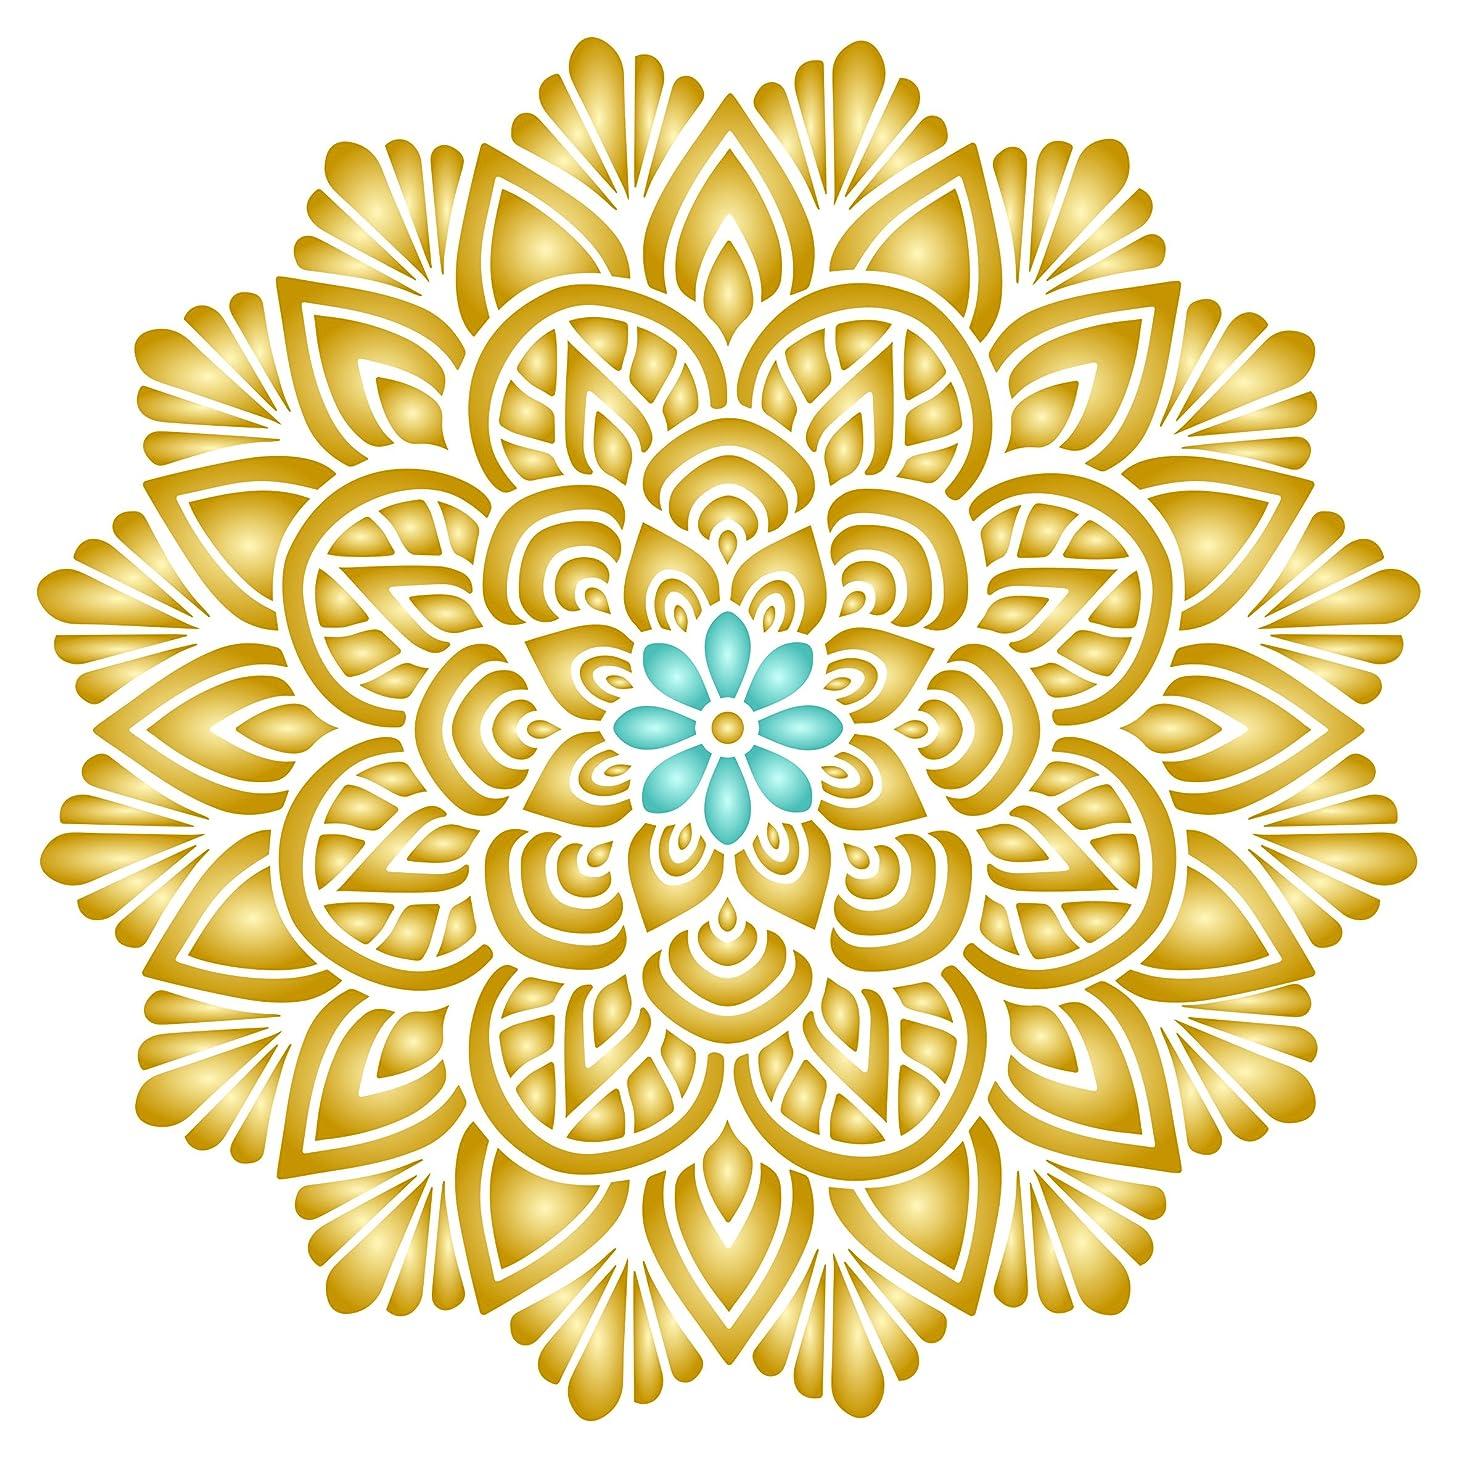 Lotus Mandala Stencil - 10 x 10 inch (M) - Reusable Asian Indian Mantra Hindu Spiritual Wall Stencil Template - Use on Paper Projects Scrapbook Journal Walls Floors Fabric Furniture Glass Wood etc.